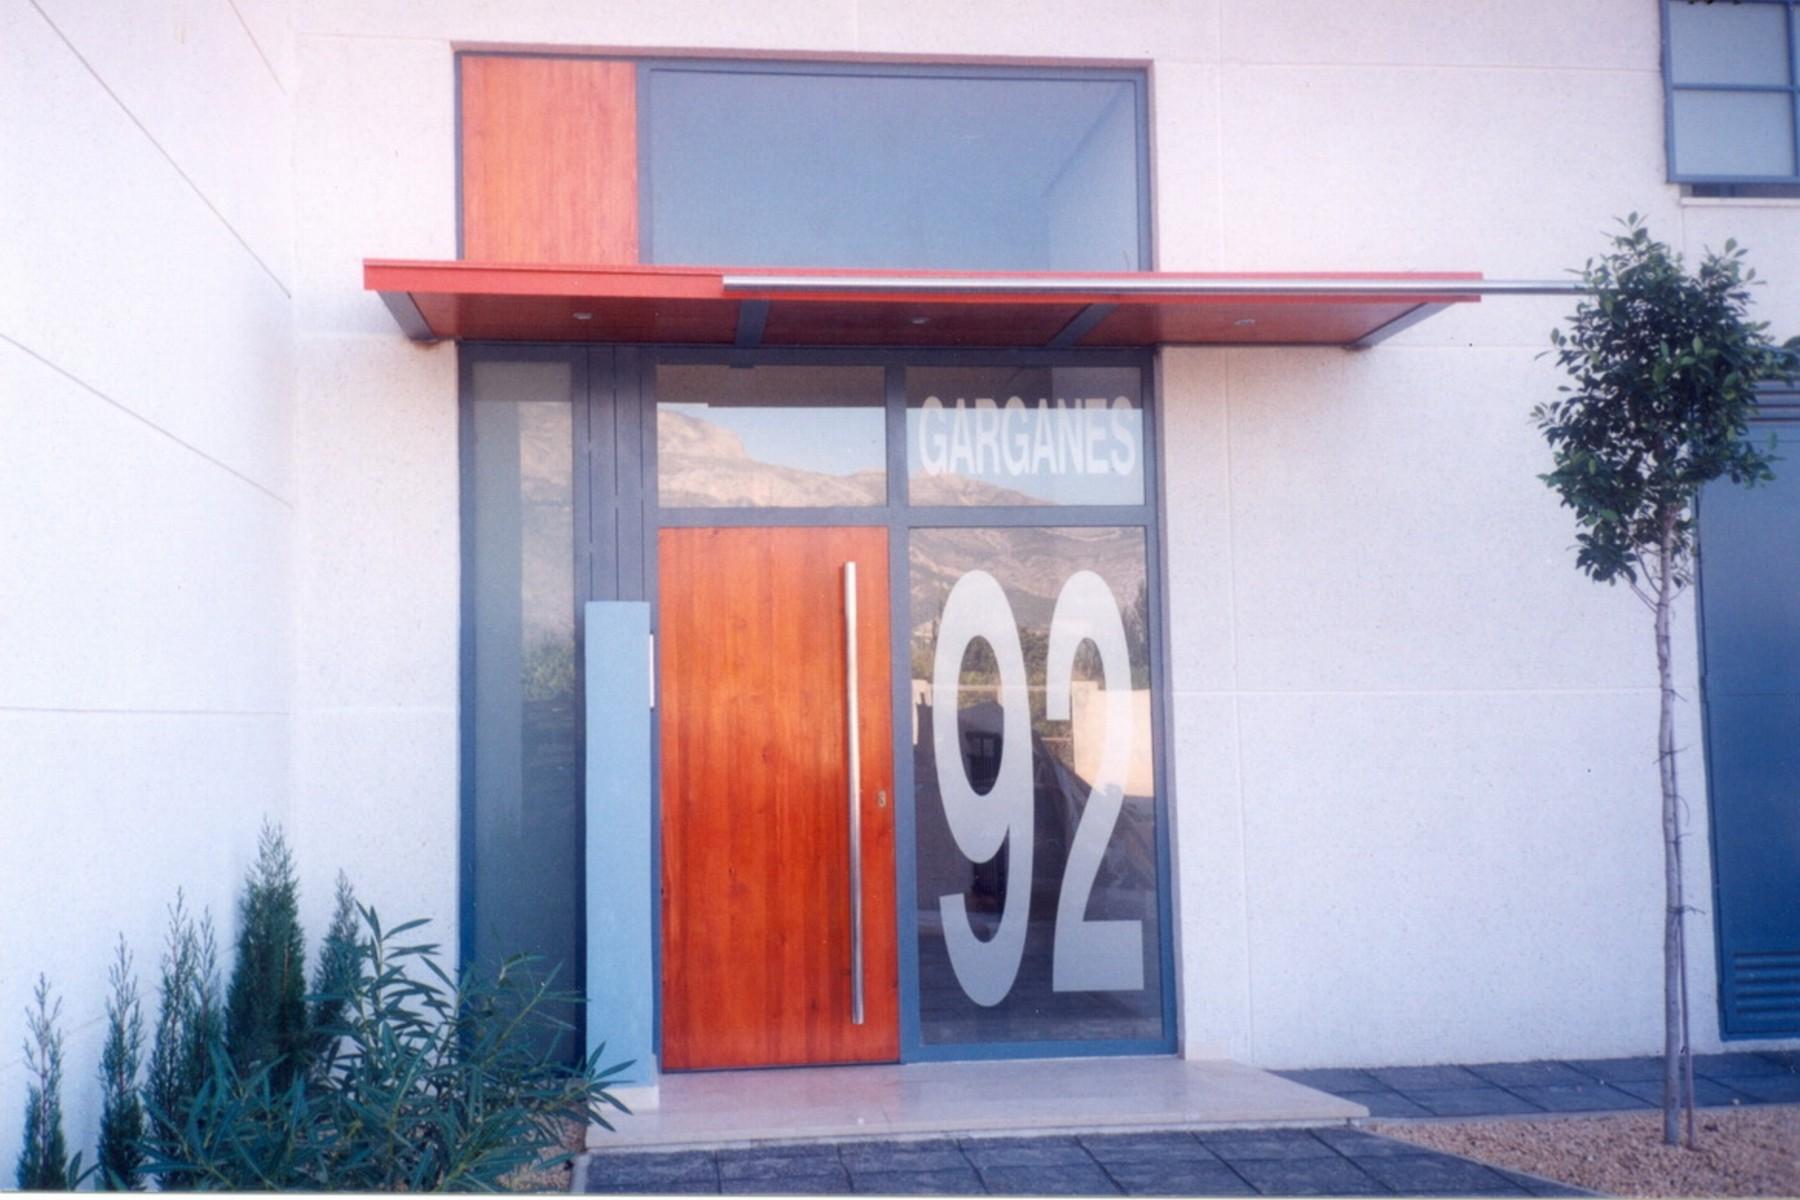 Imaginarq-053-Edificio-Viviendas-Altea-Alicante-06A